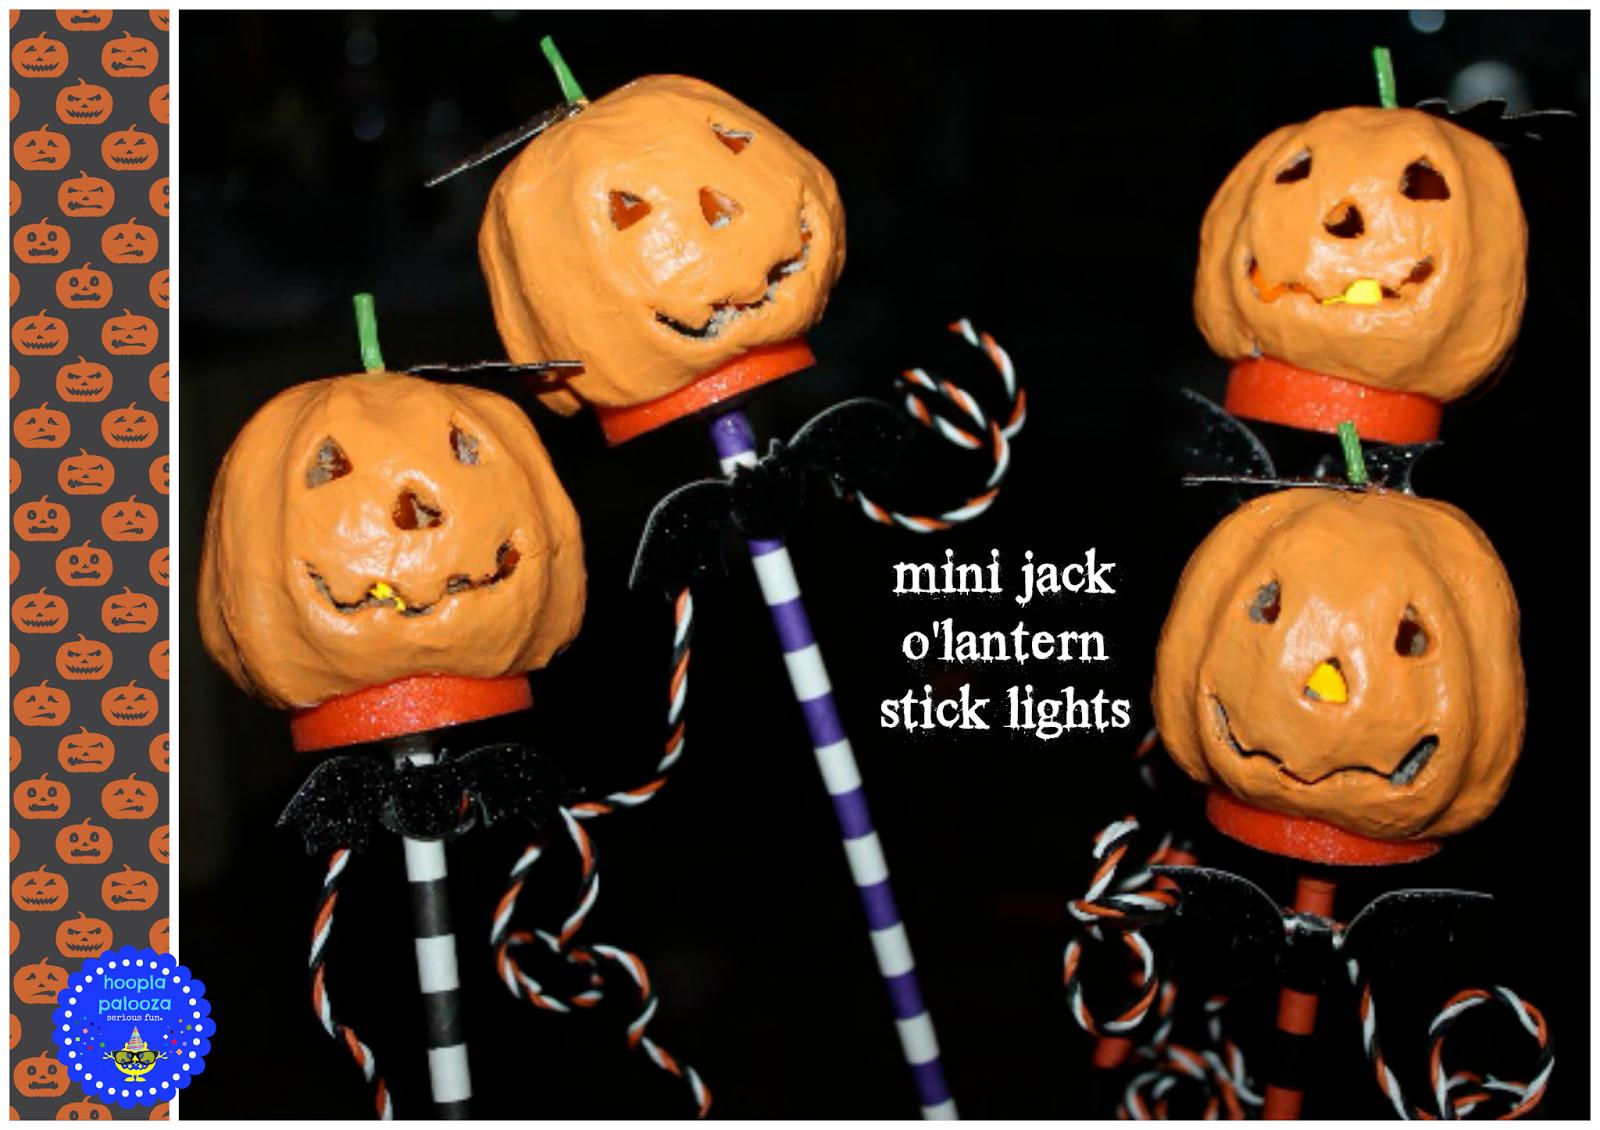 mini jack o'latern stick lights